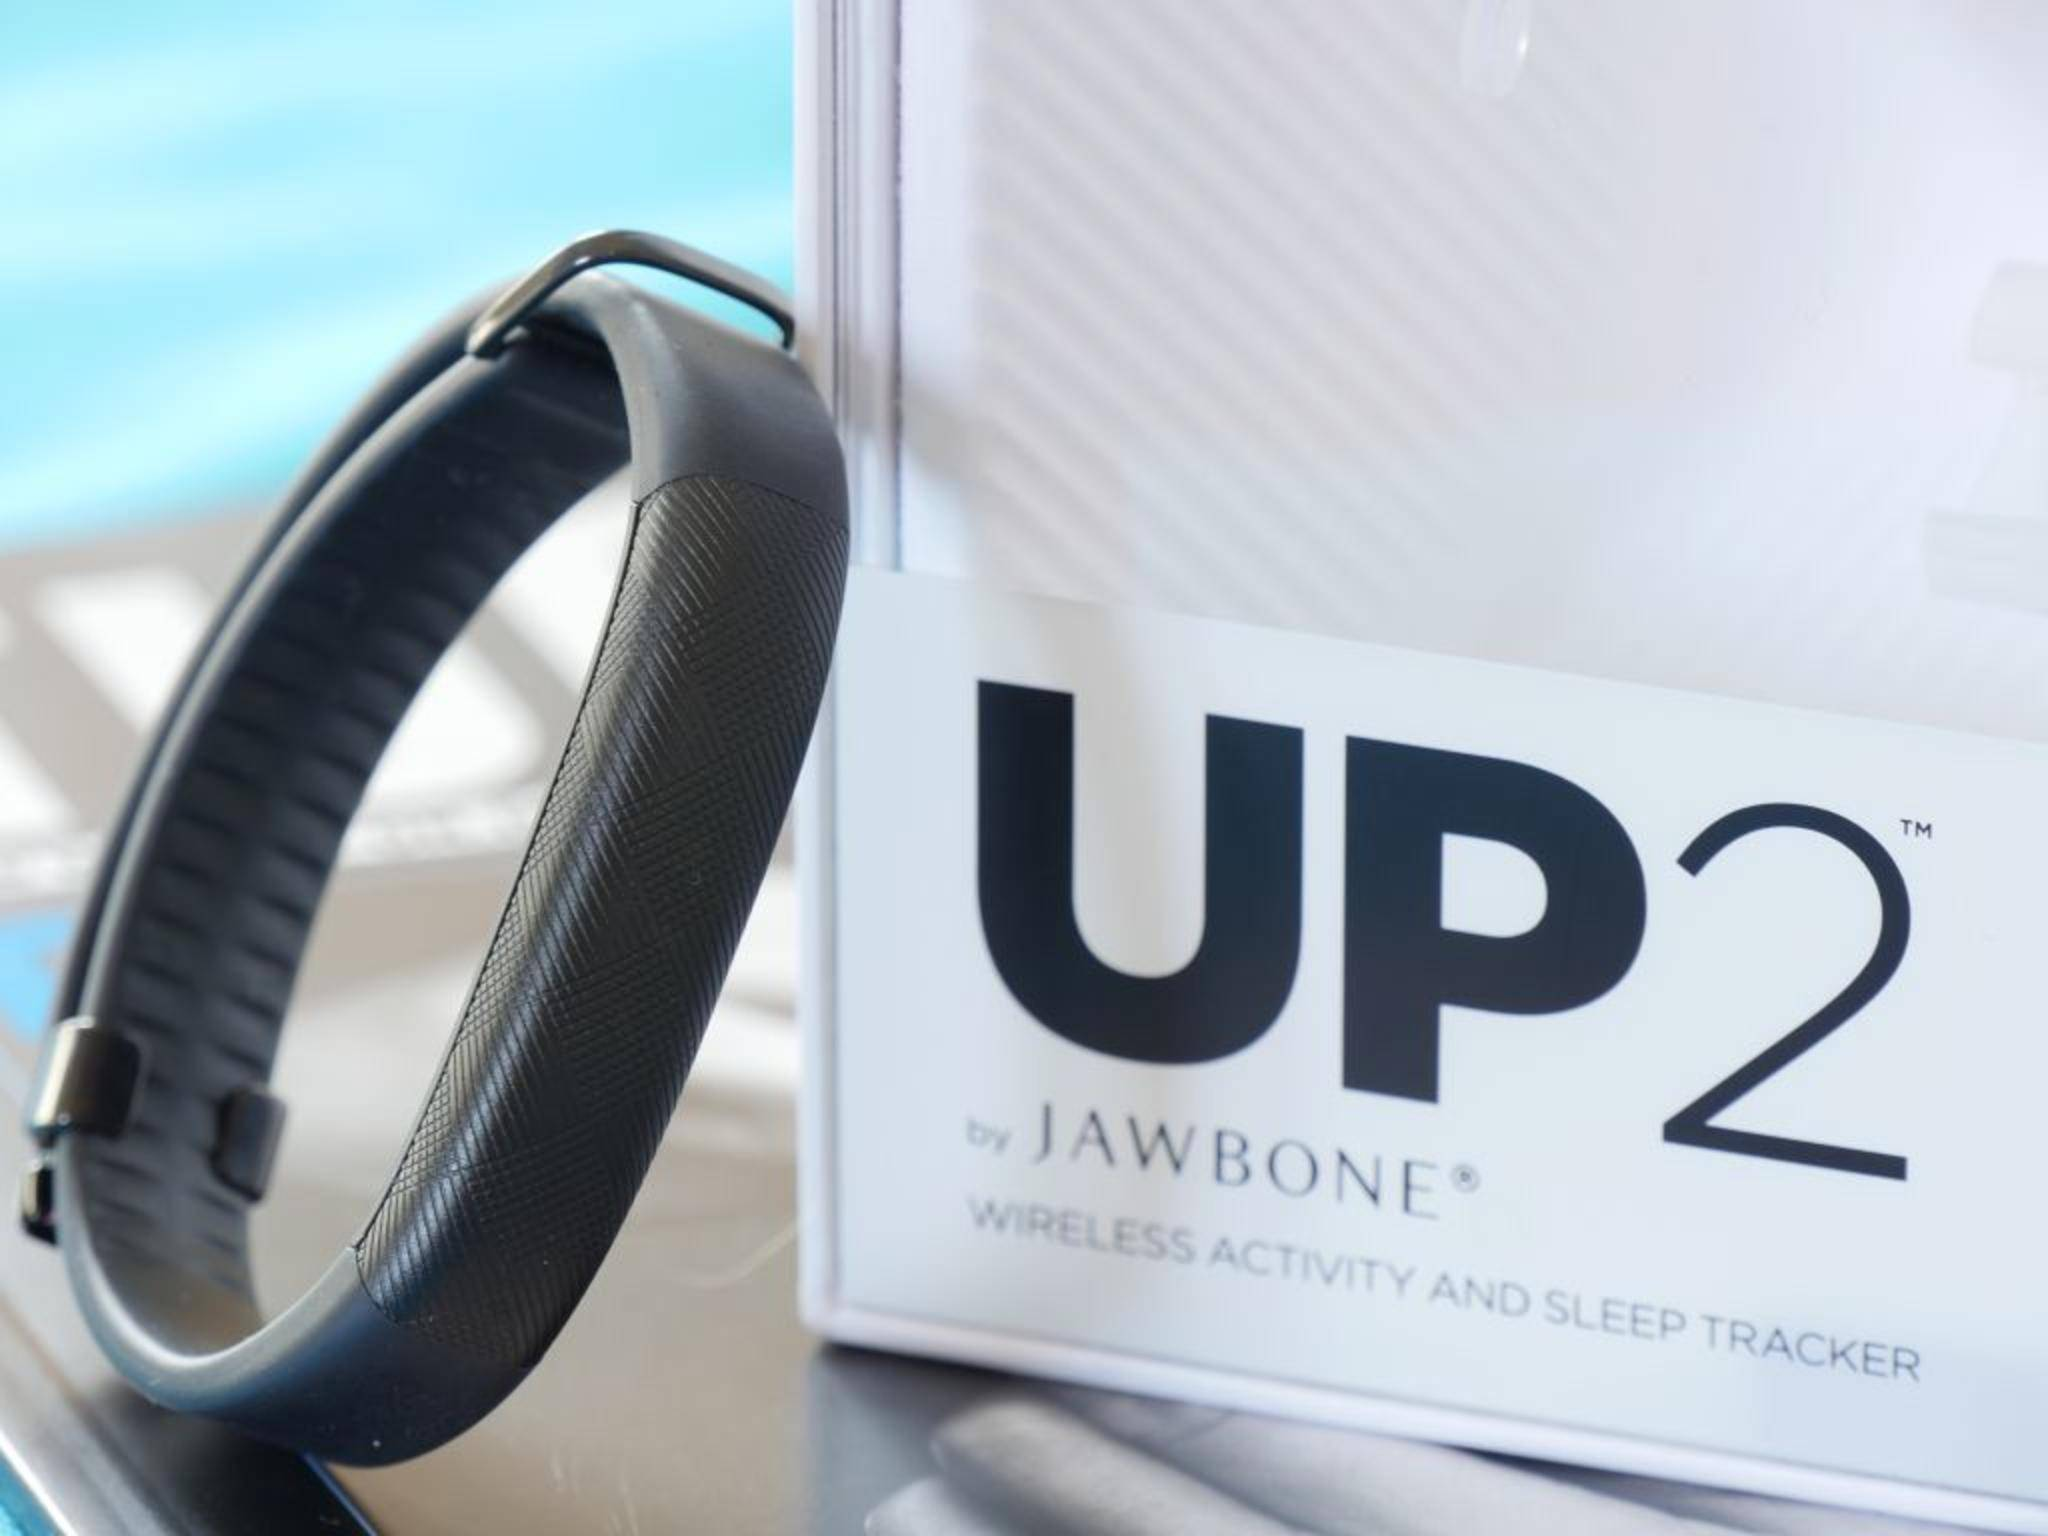 Jawbone Up2 8